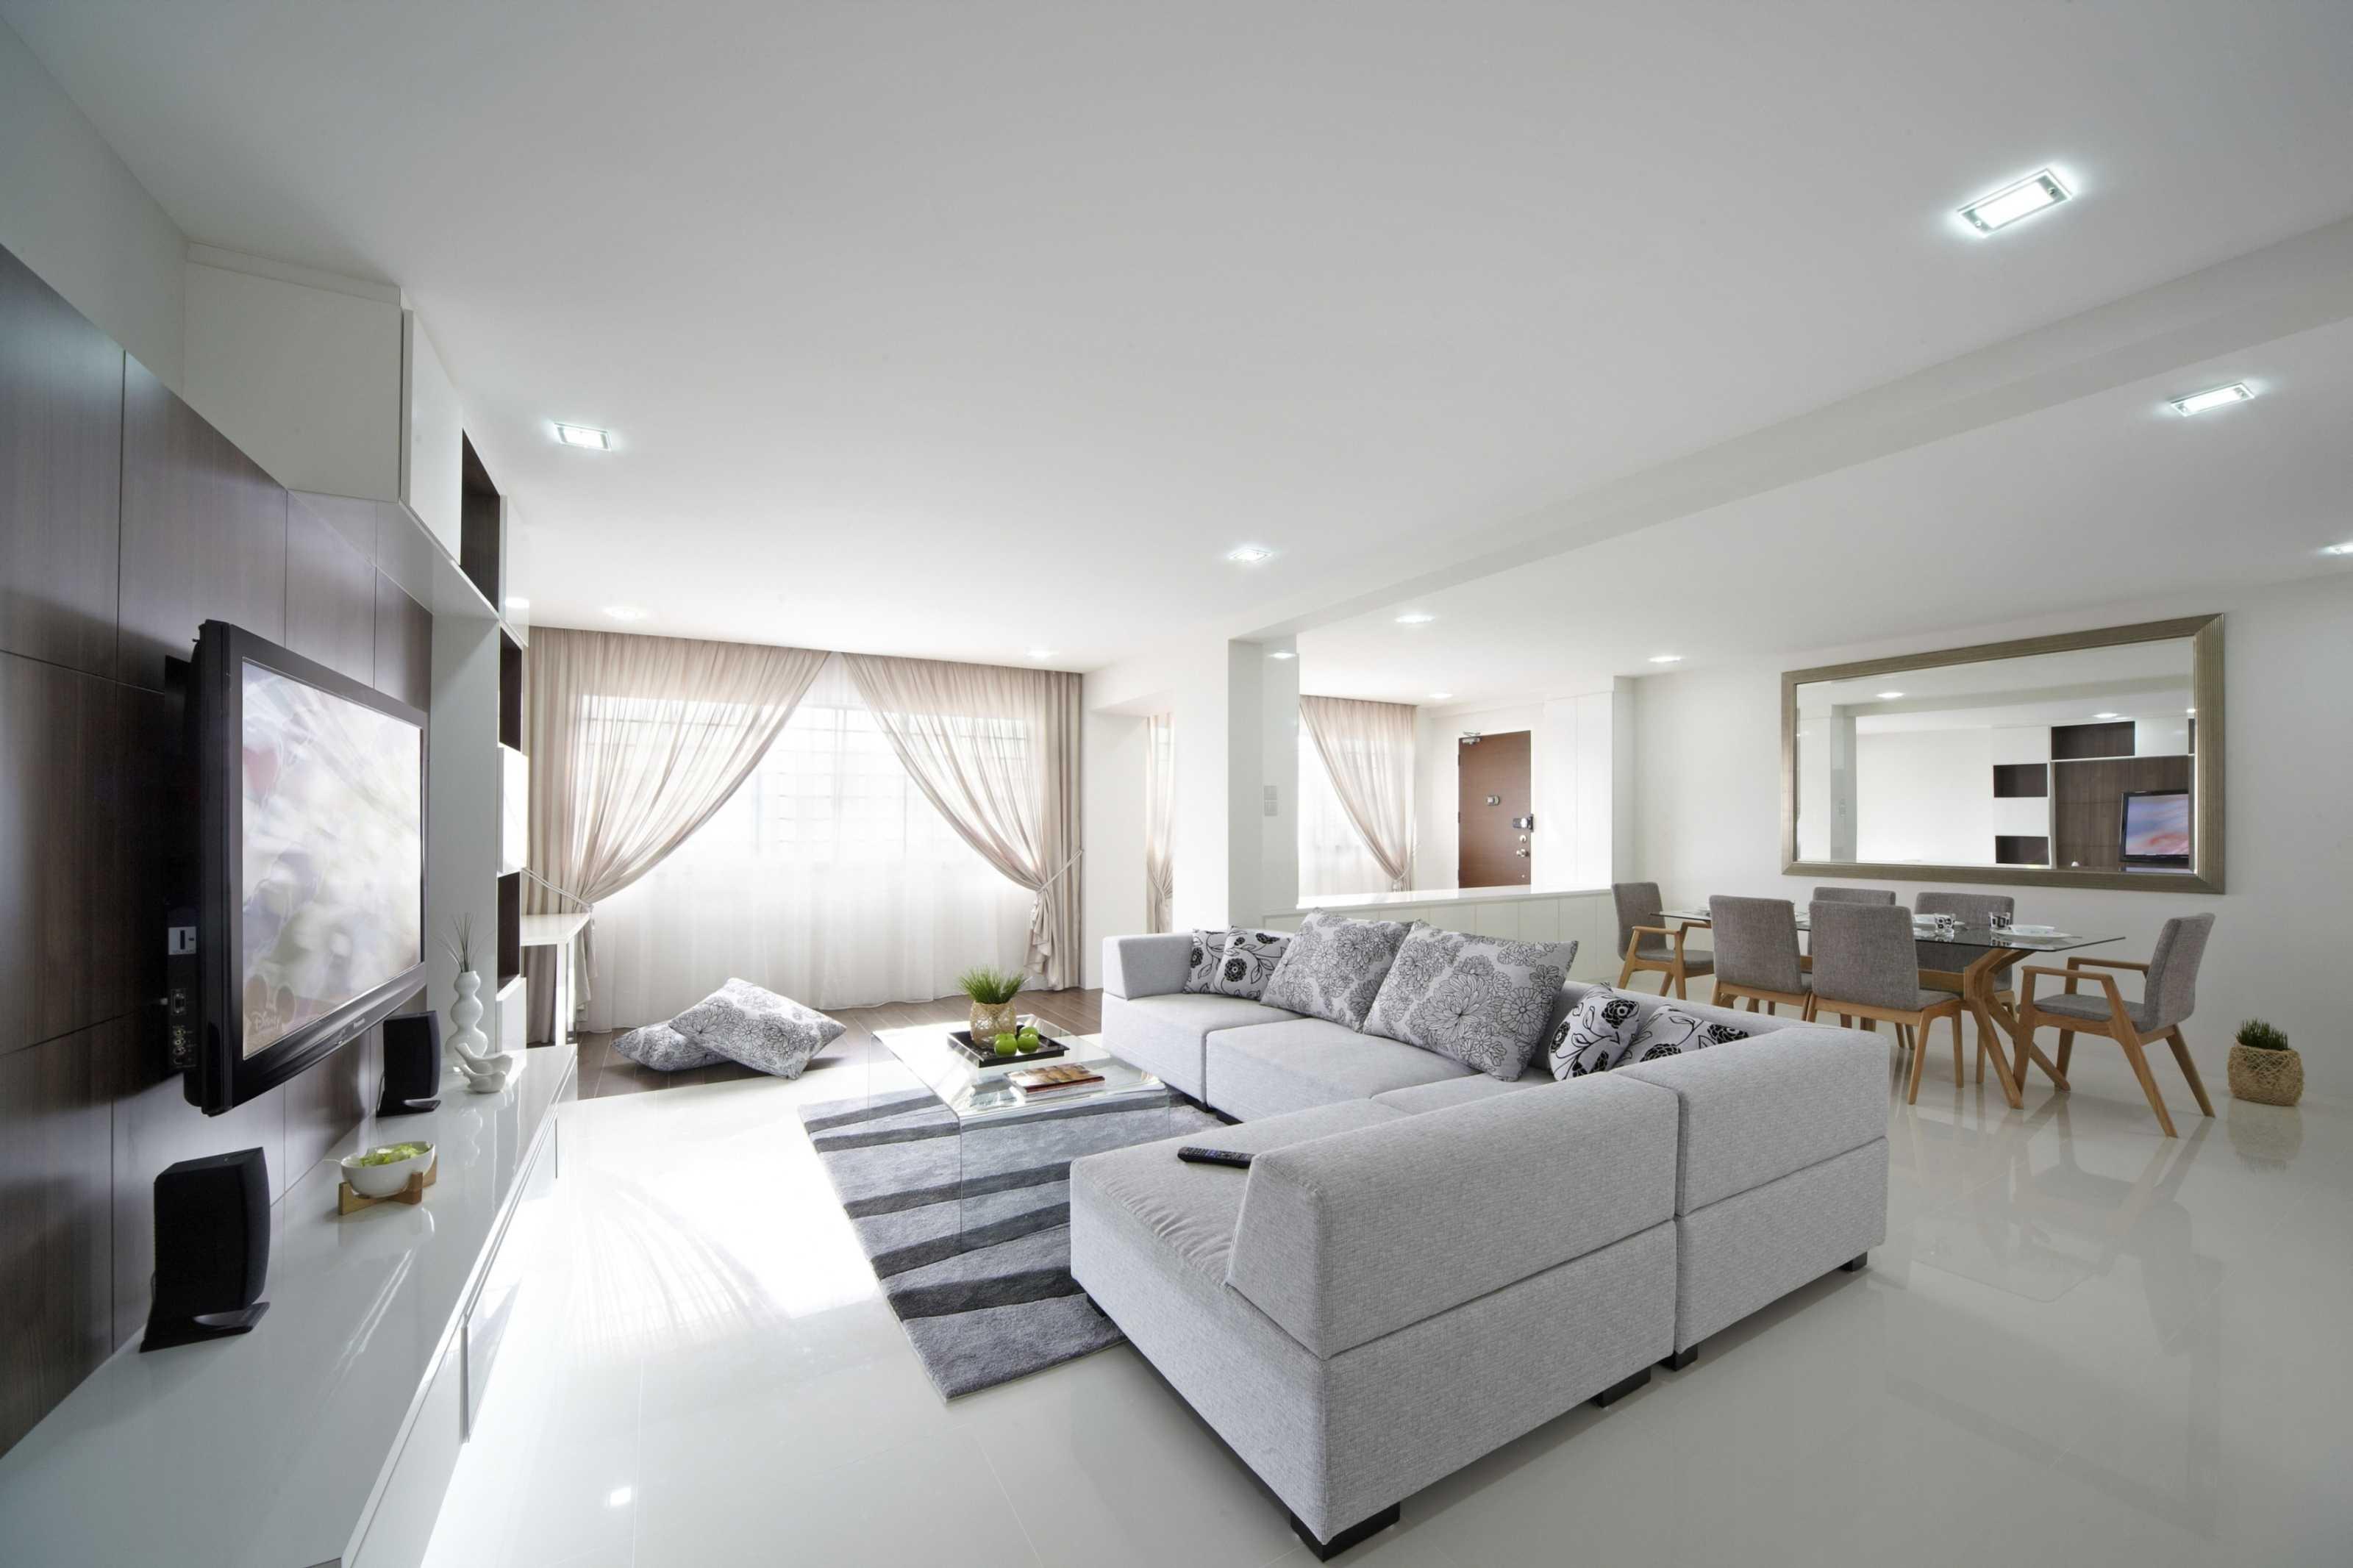 Белый интерьер с угловым диваном